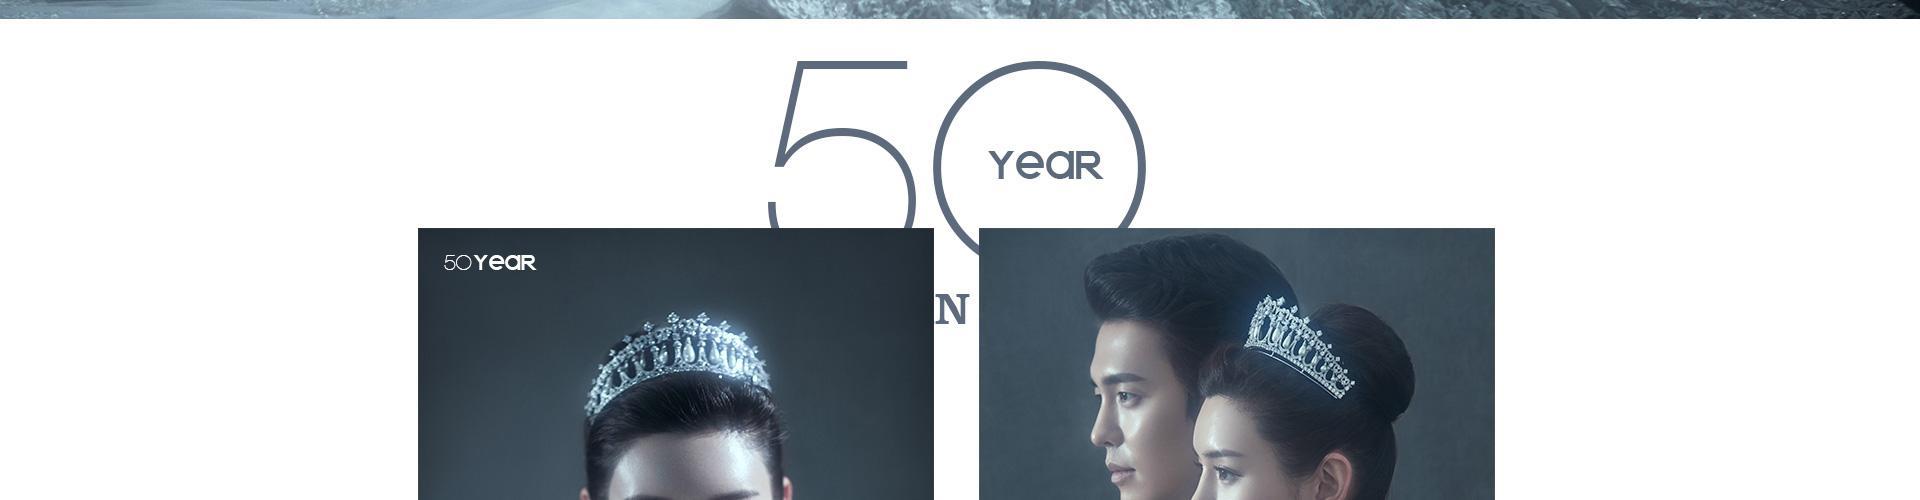 《经典50年》